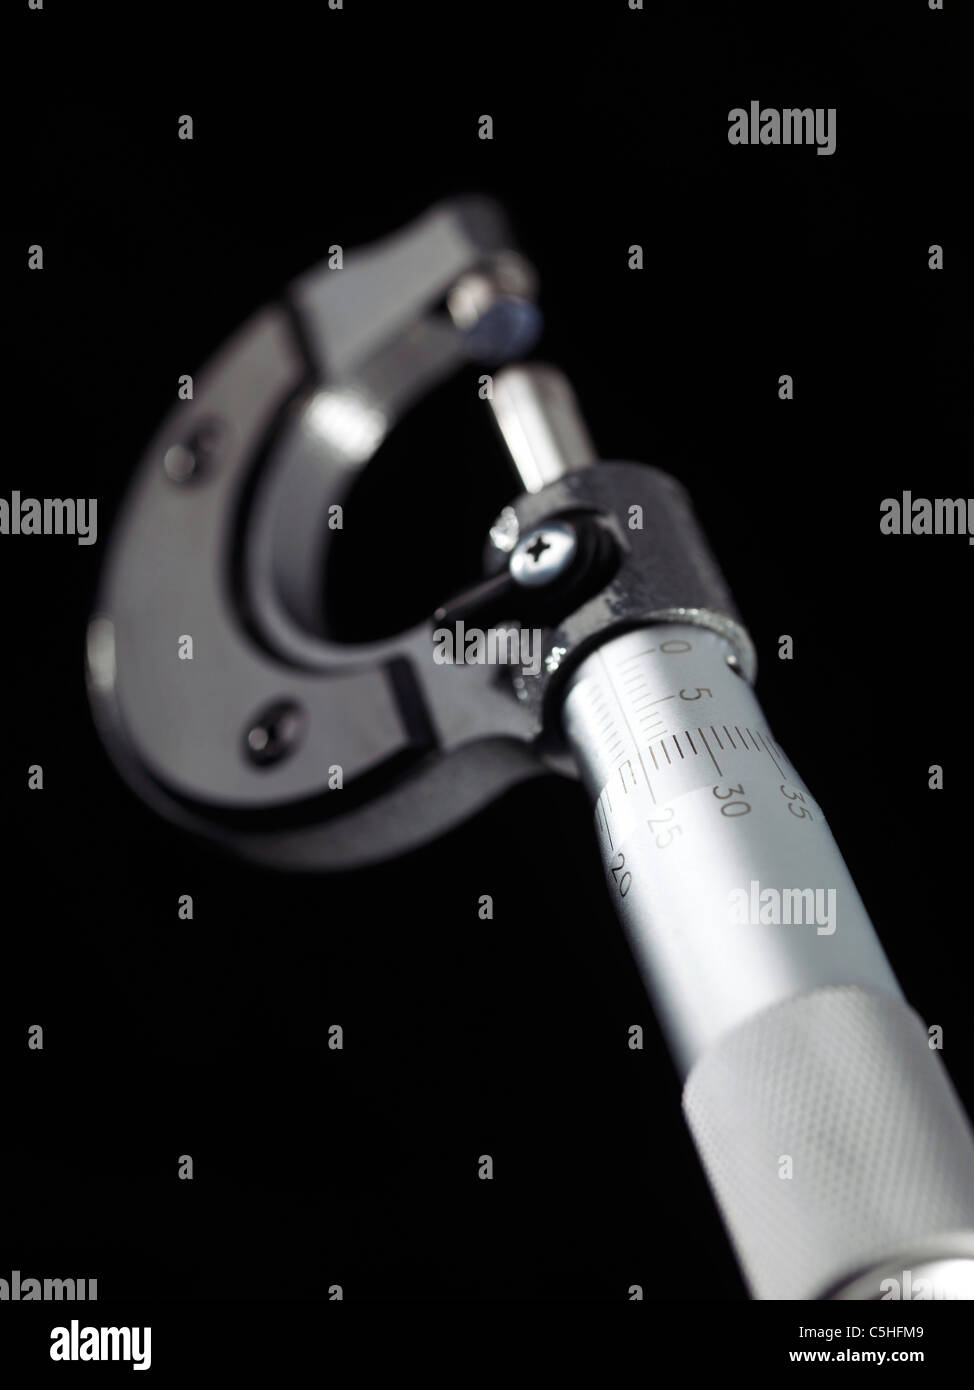 External micrometer - Stock Image